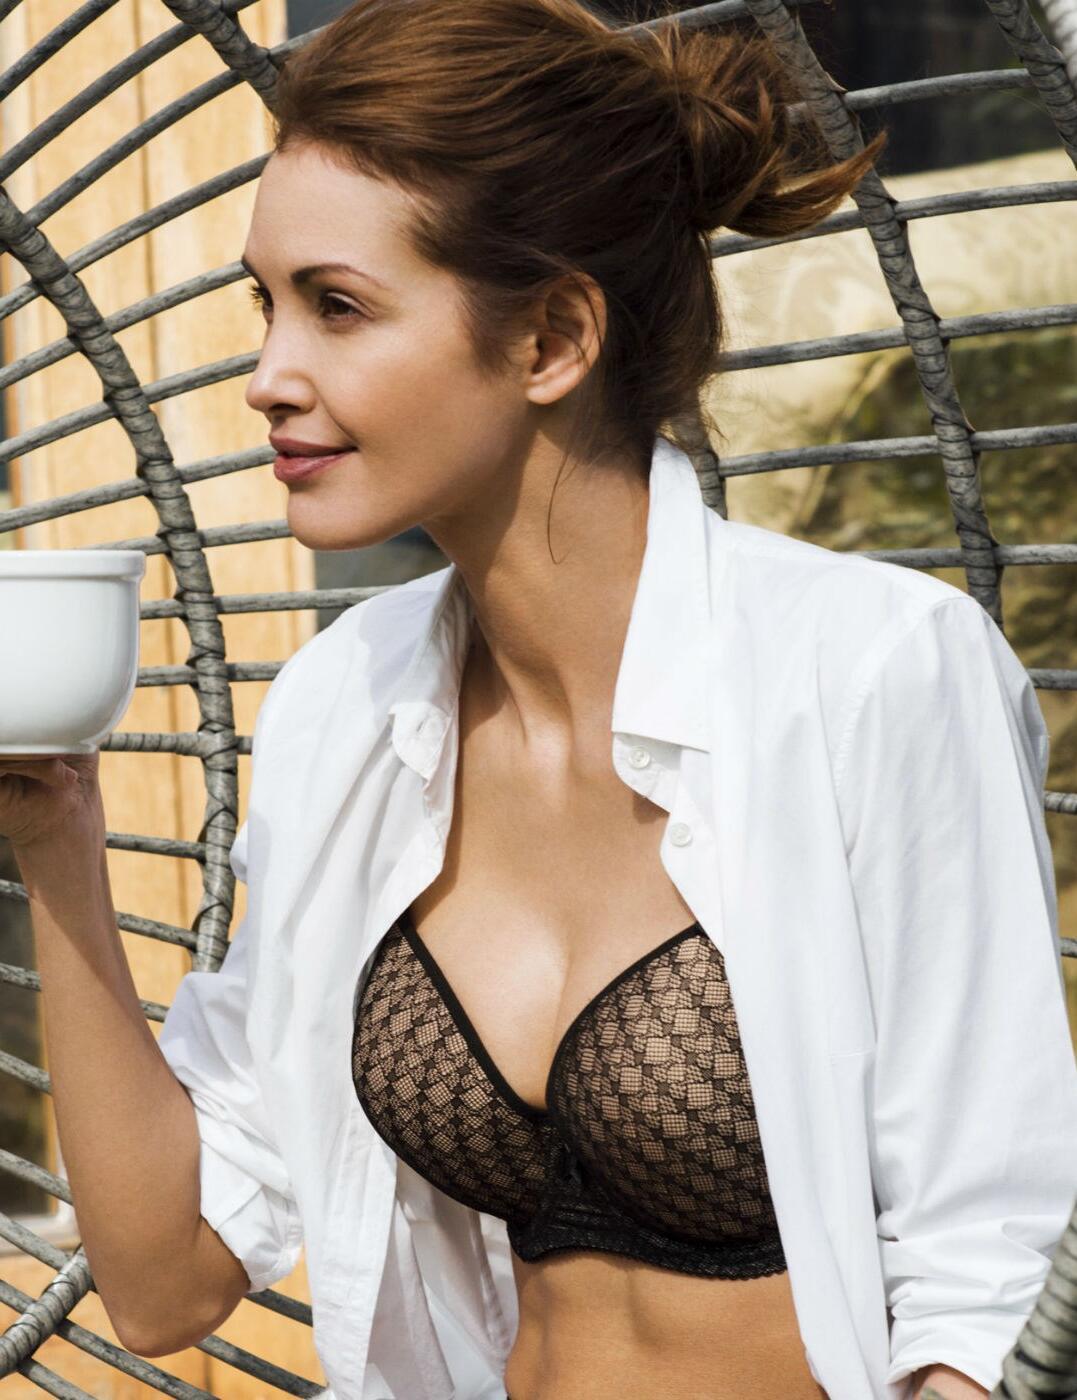 Fantasie Neve Underwired Moulded Bra 3000 Womens Balcony T-Shirt Bra